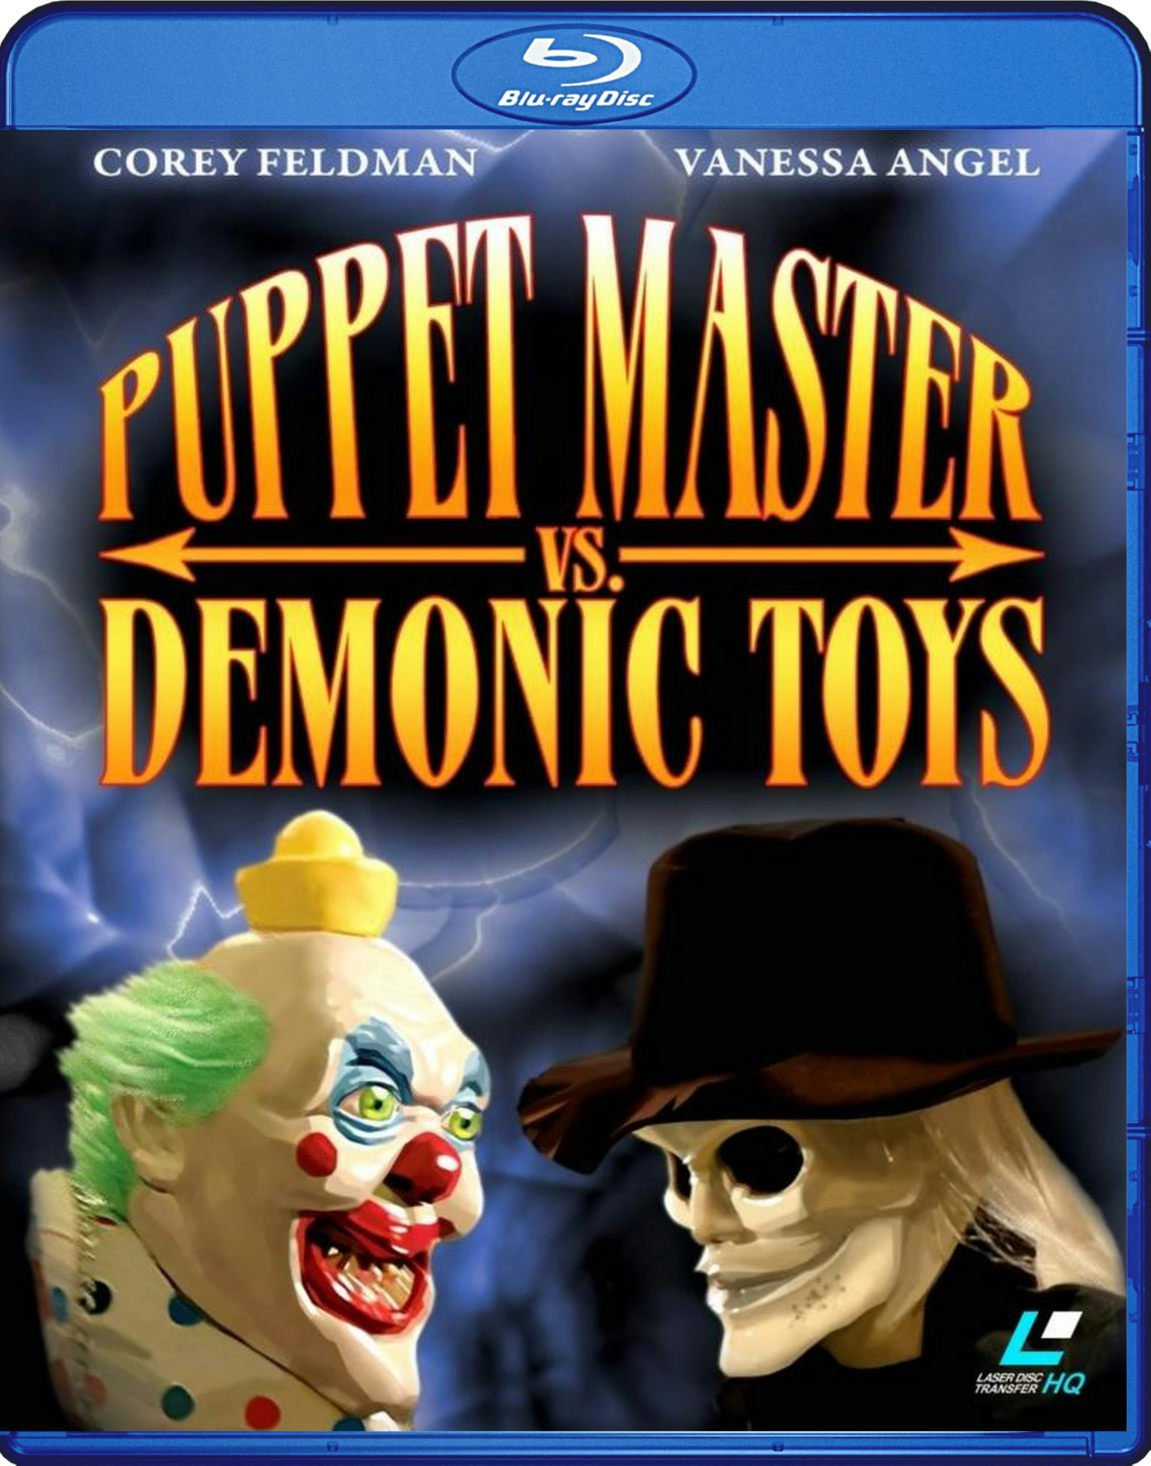 Puppet Master Vs. Demonic Toys Blu-Ray (2004) Transferred from Lazerdisc to BD